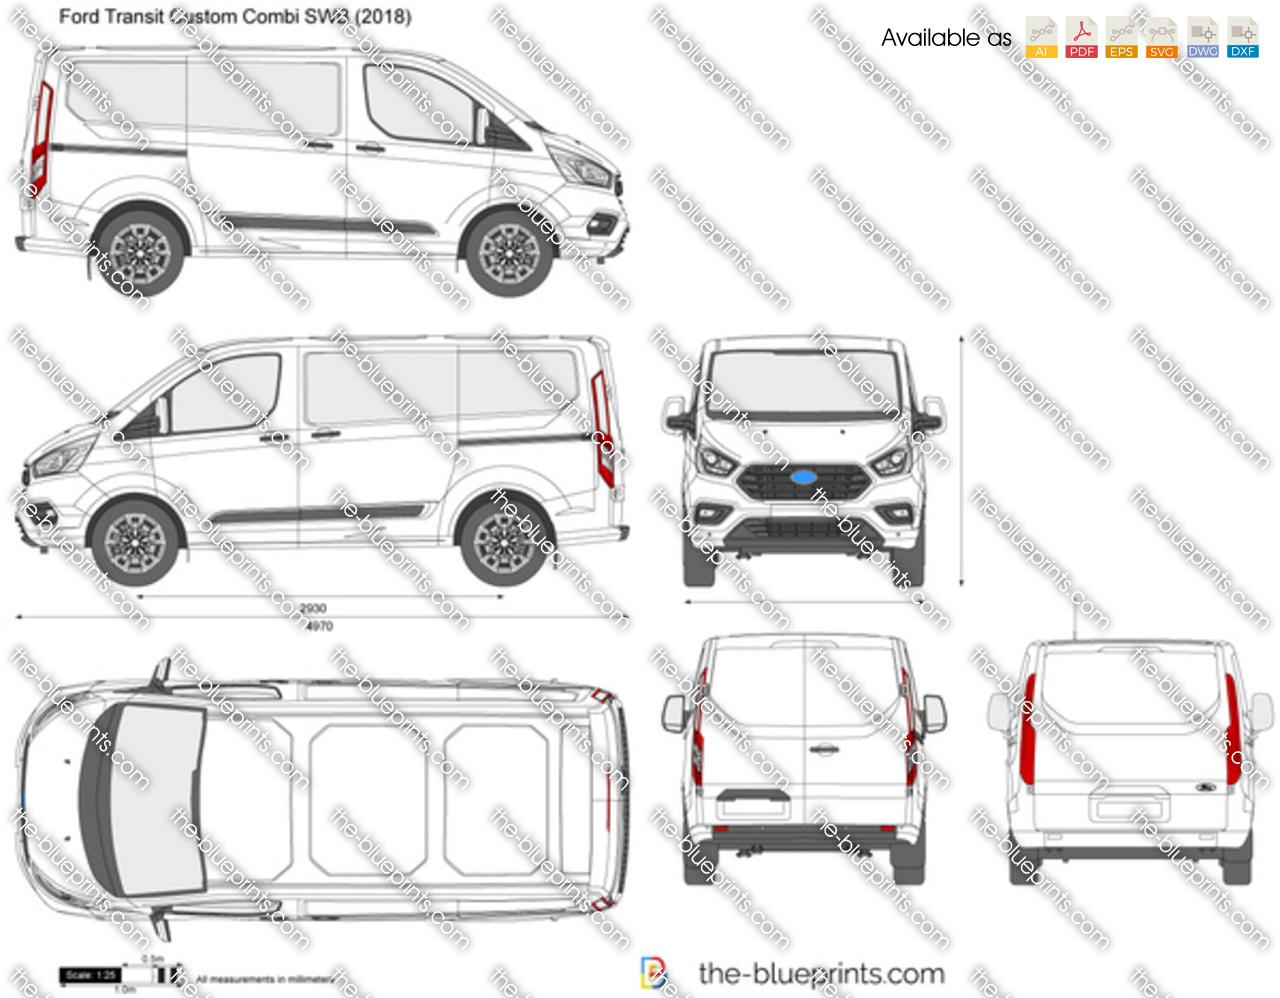 Ford Transit Custom Combi SWB 2018